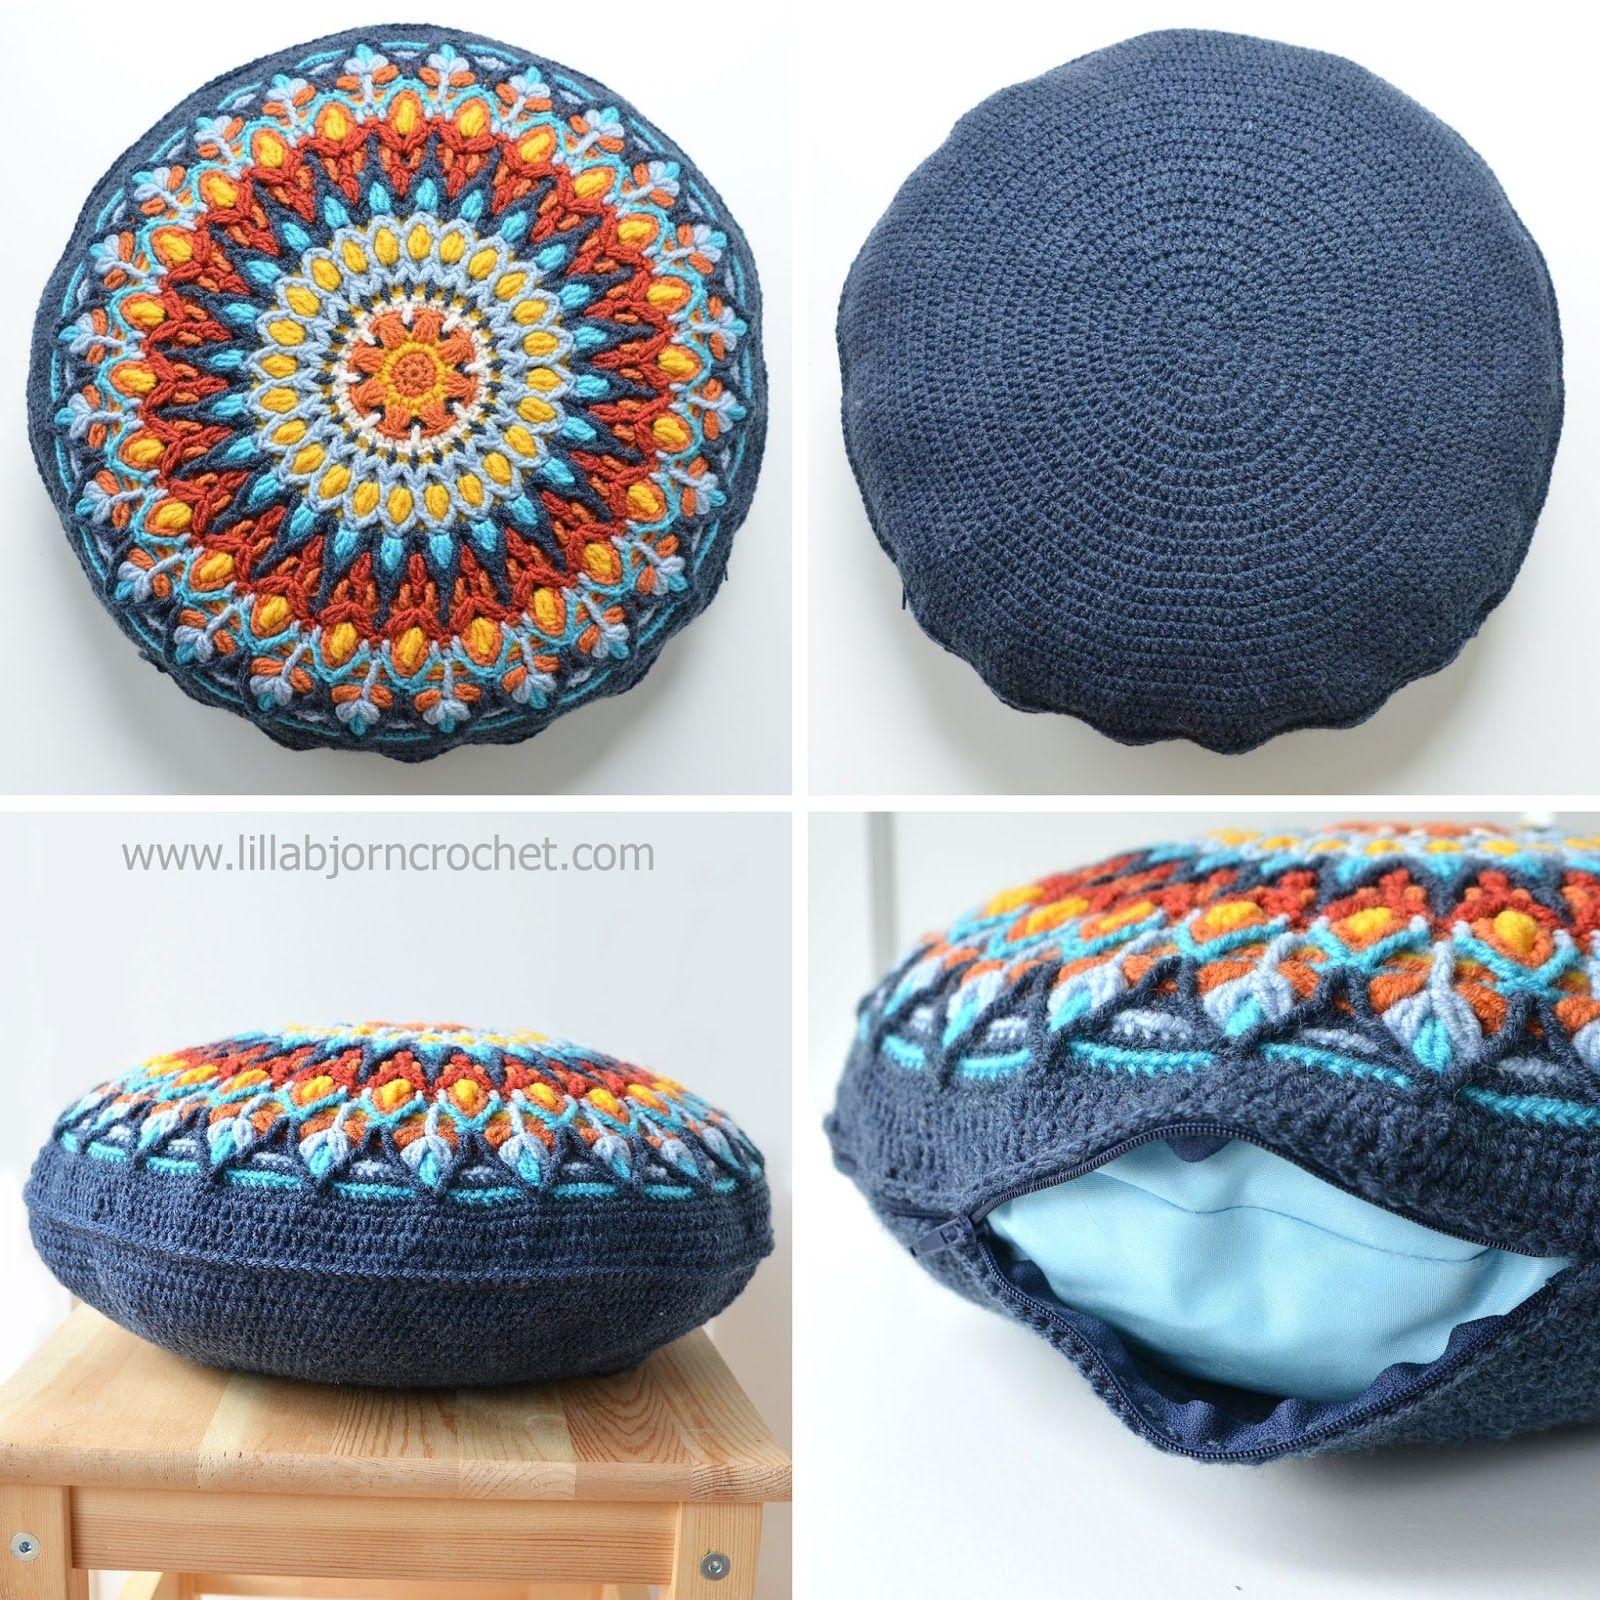 Spanish Mandala Cushion - pattern by Lilla Bjorn Crochet | Pillows ...